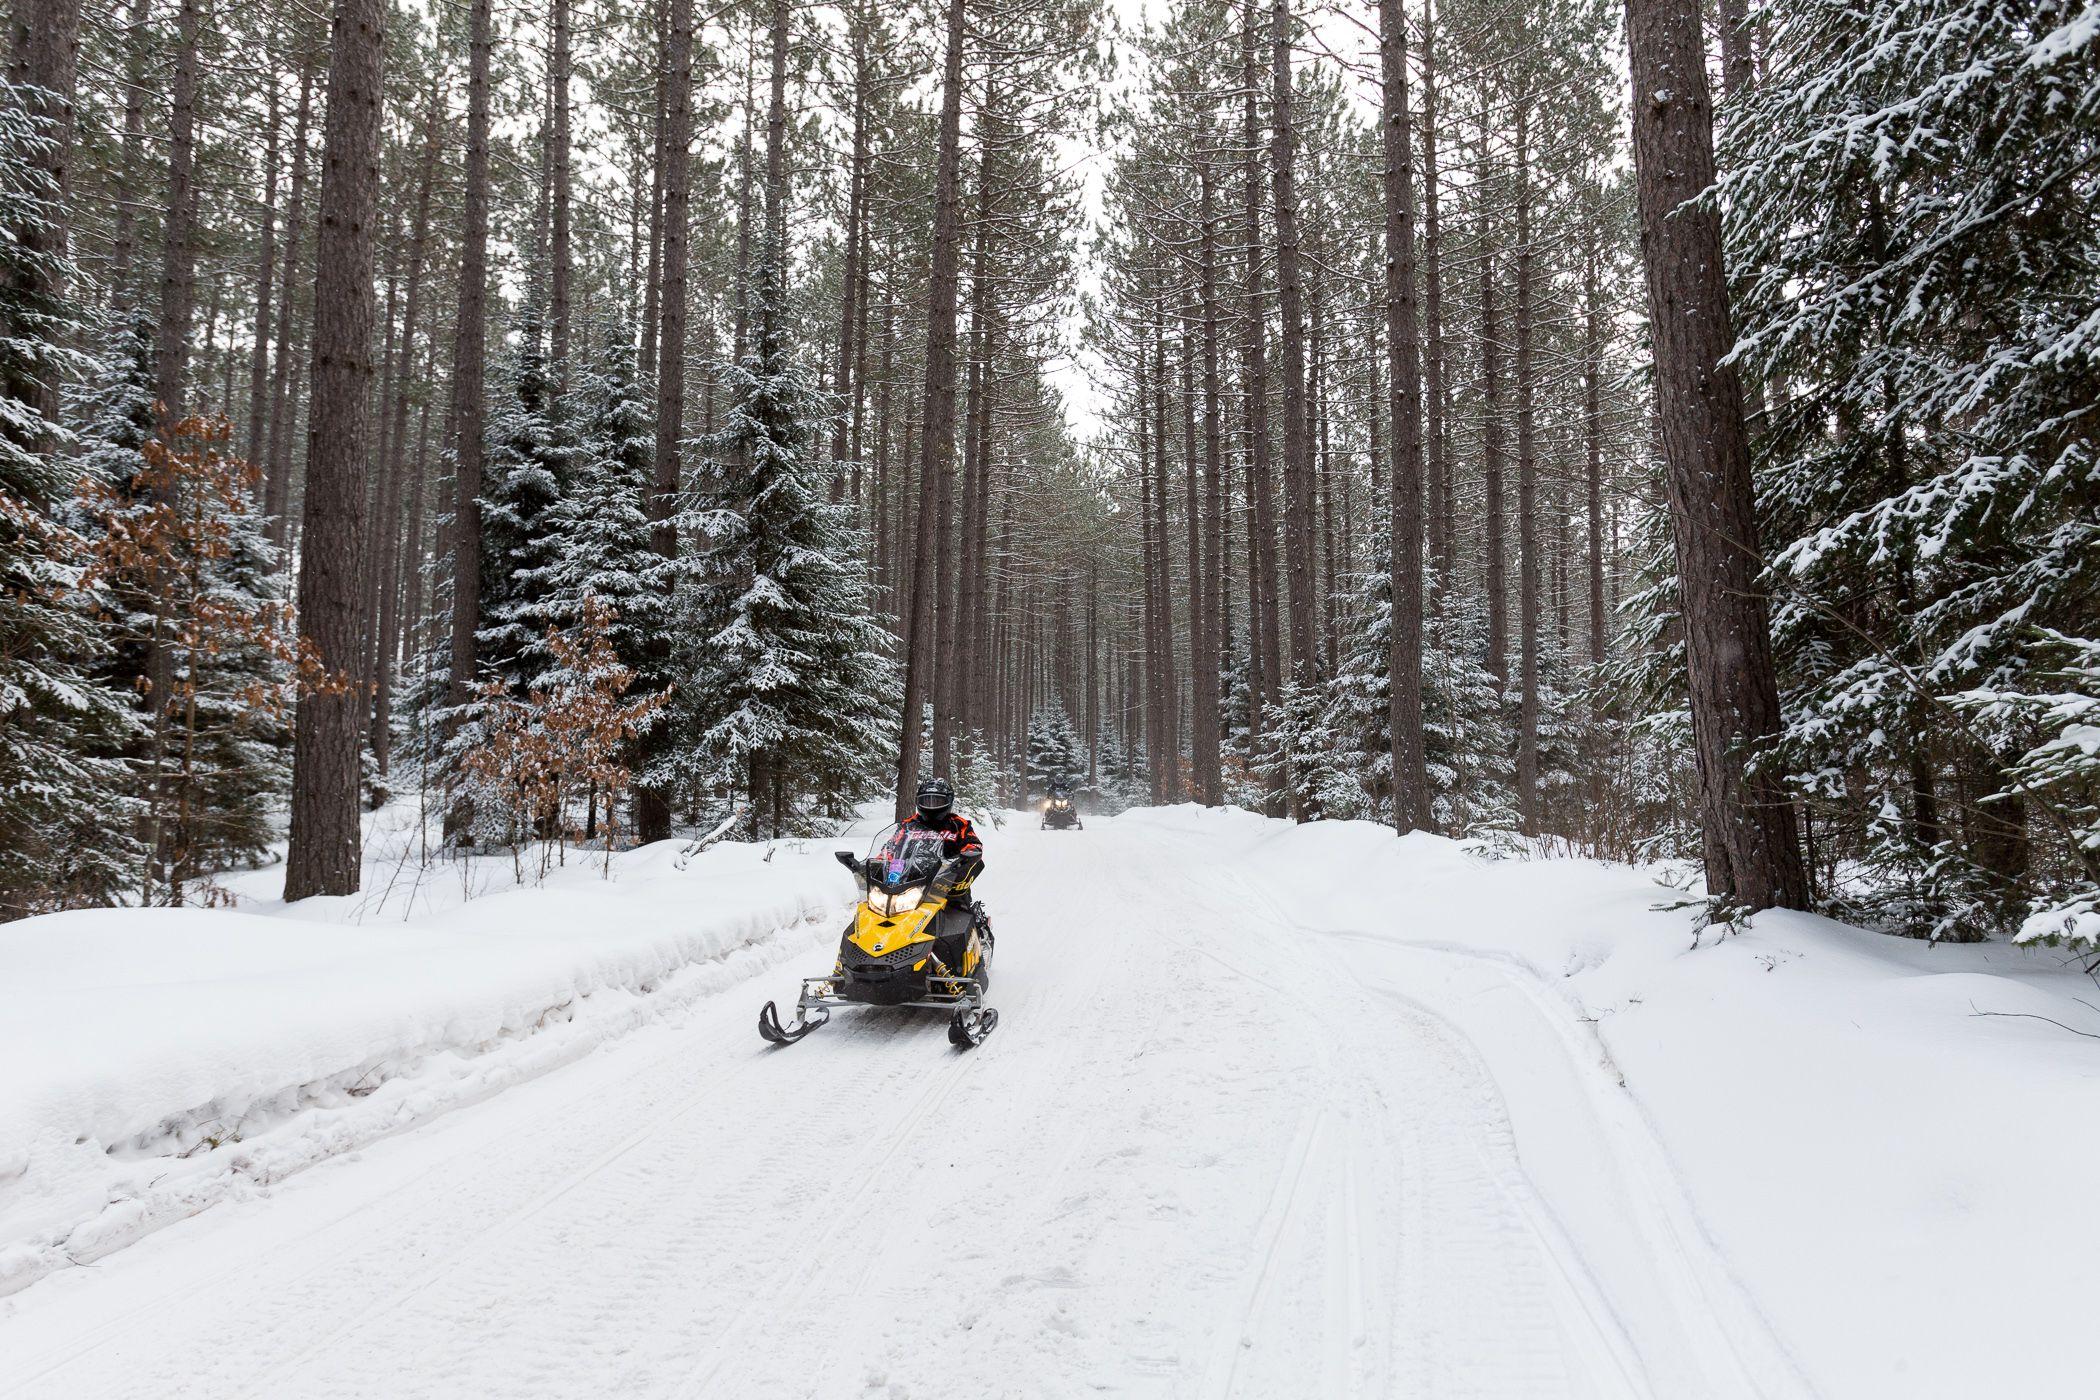 Best Ski Resorts And Winter Activities Near Chicago